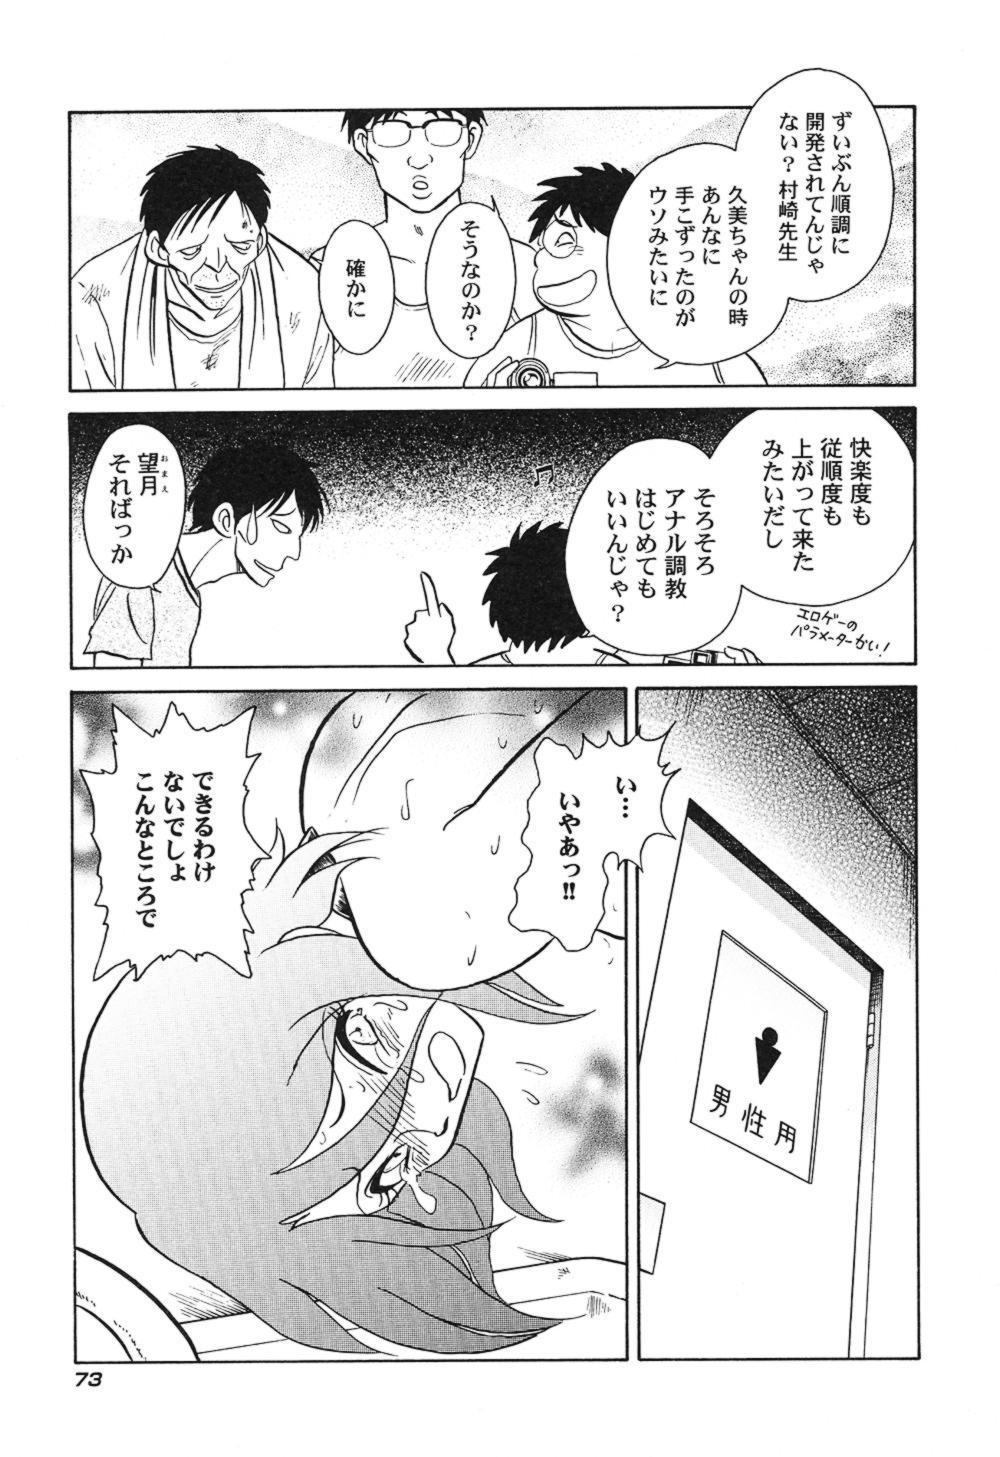 Hageshii Kagai Jugyou 75